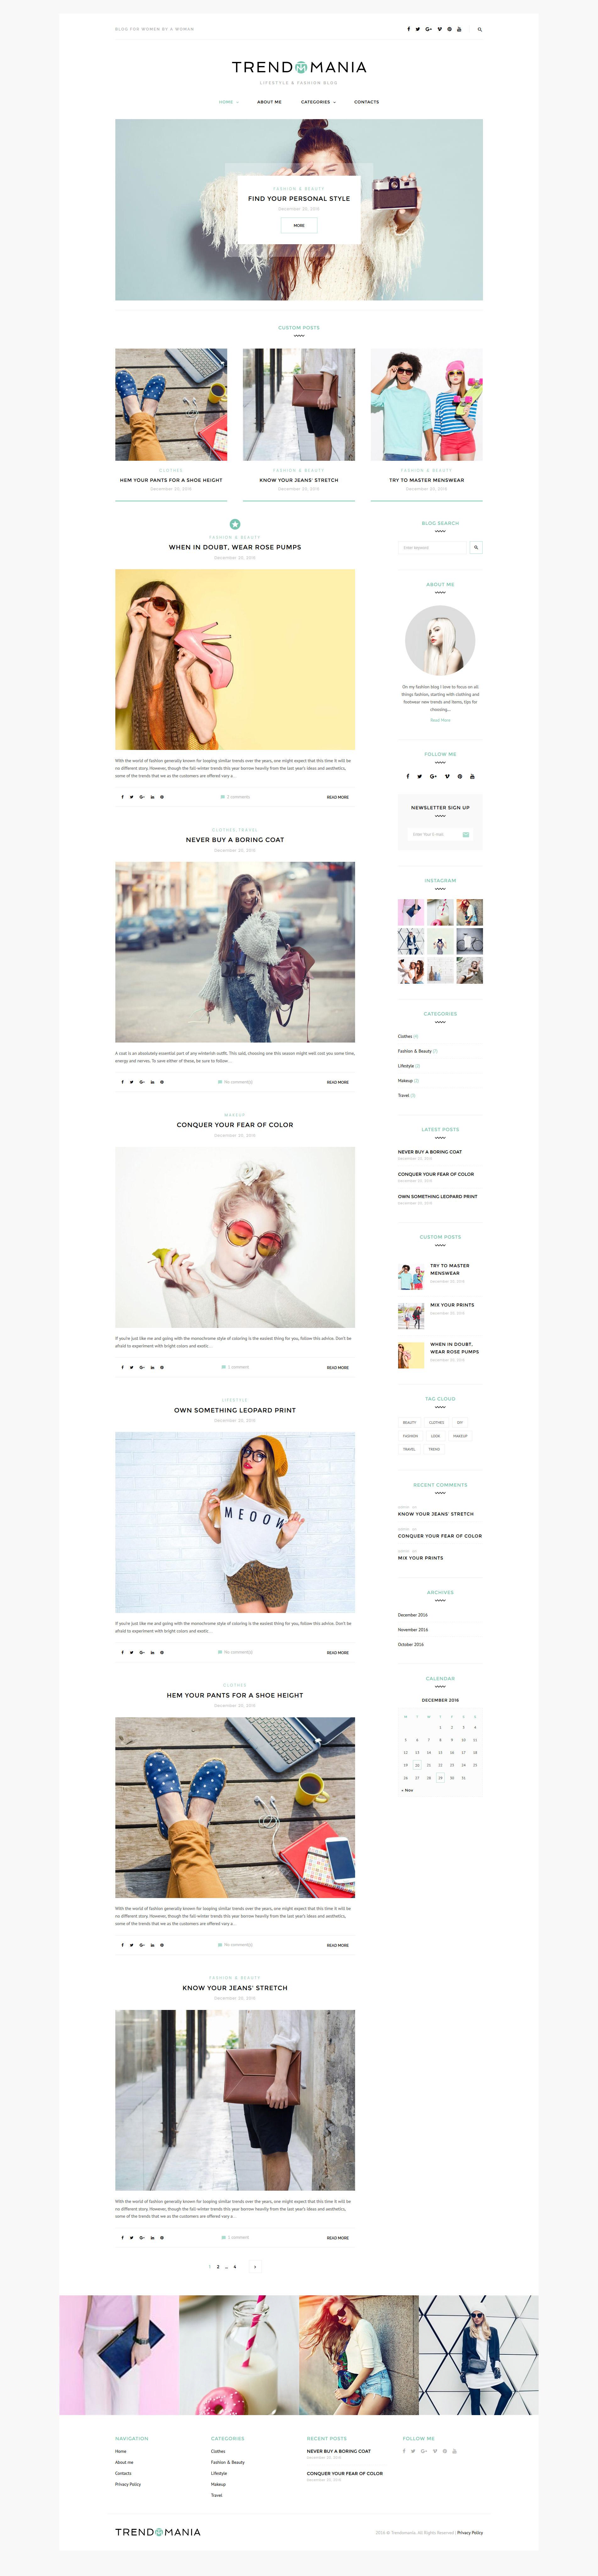 """Trendomania - Lifestyle & Fashion Blog"" 响应式WordPress模板 #58957"